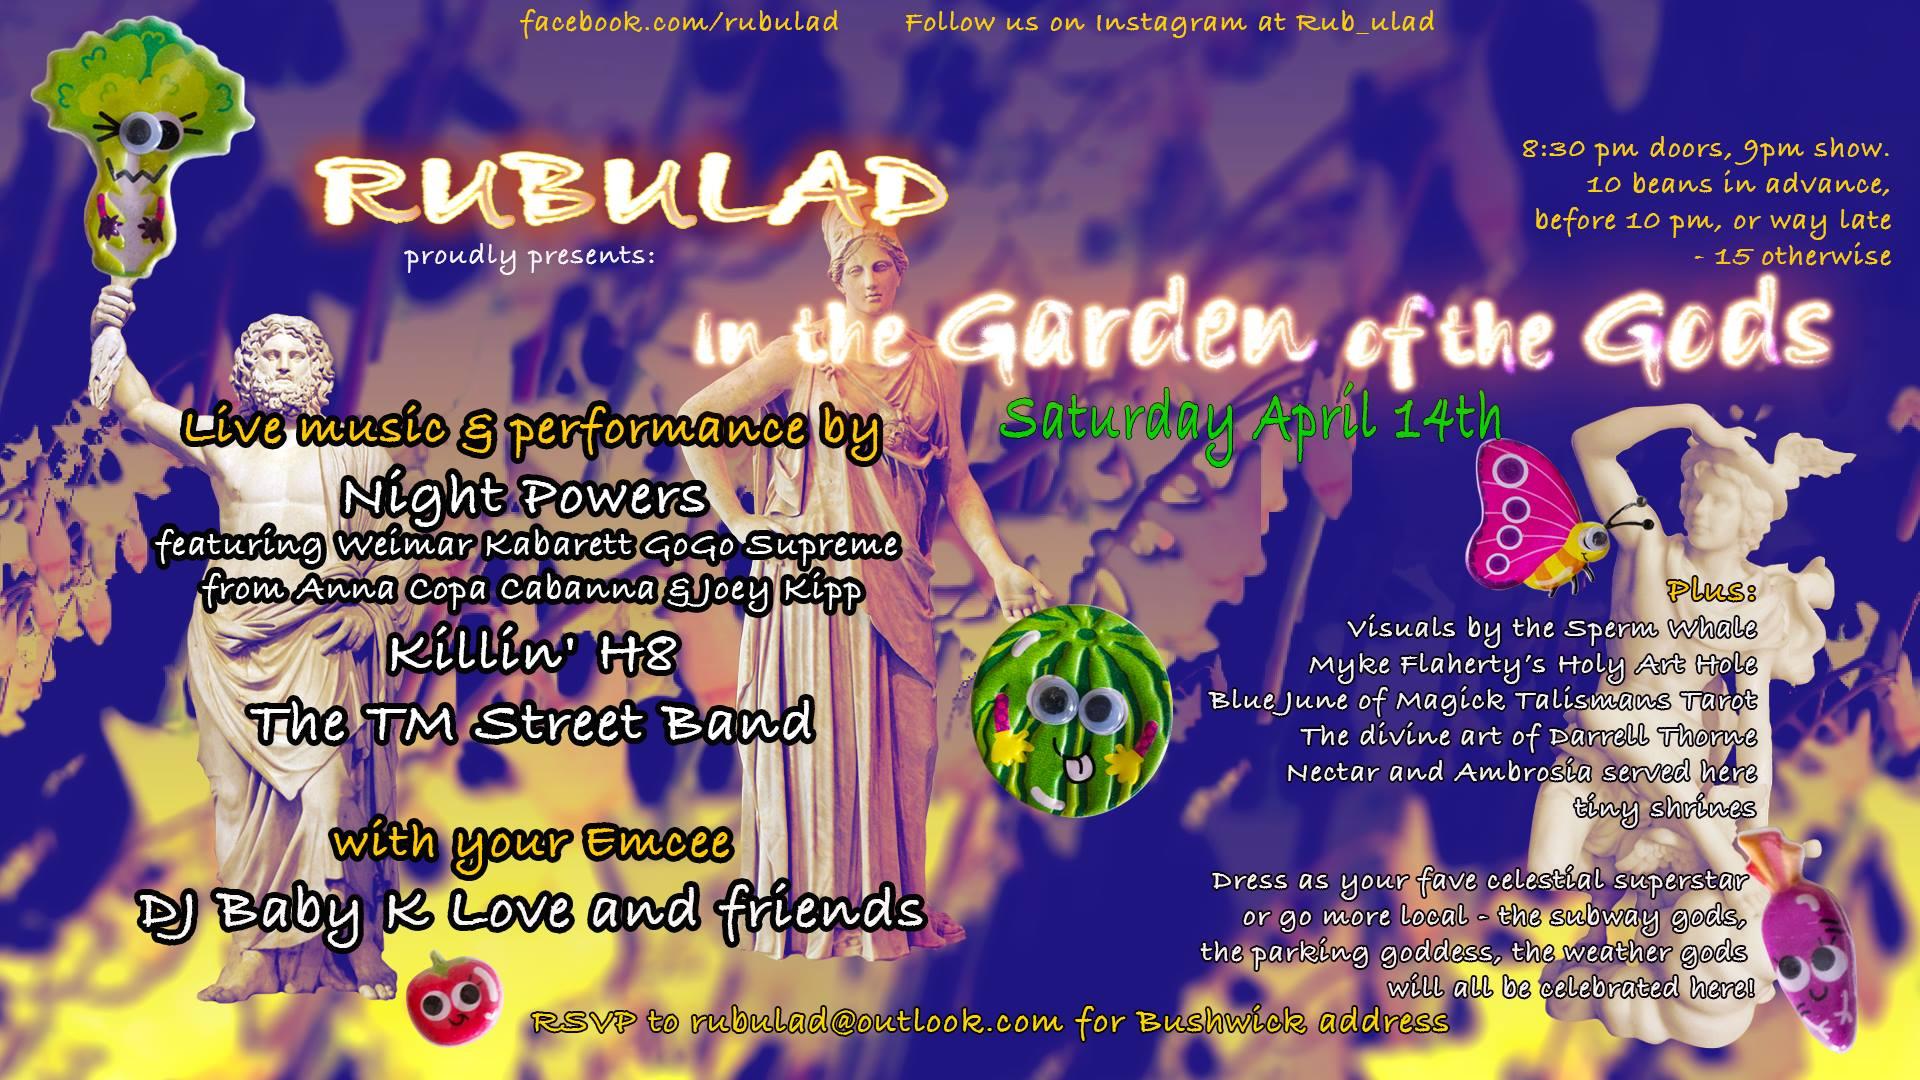 Rubulad Presents In The Garden Of The Gods